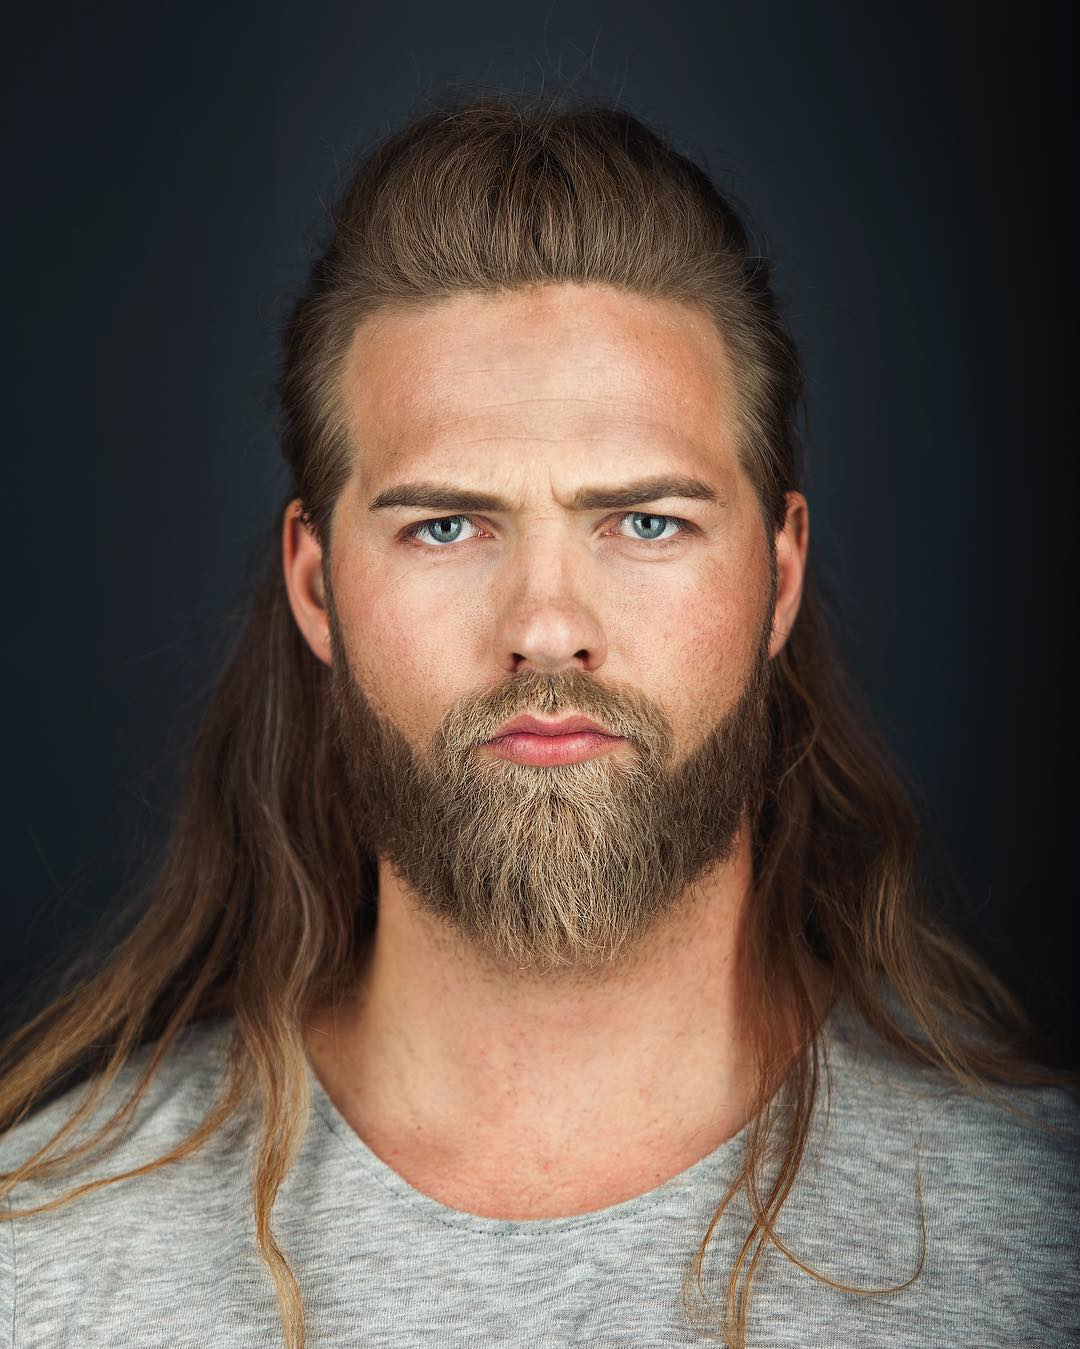 barba 2017, cabelo longo masculino, cabelo loiro, homem estiloso, tenente da marinha, moda sem censura, alex cursino, estilo viking, lumberssexual, mens, grooming, (10)